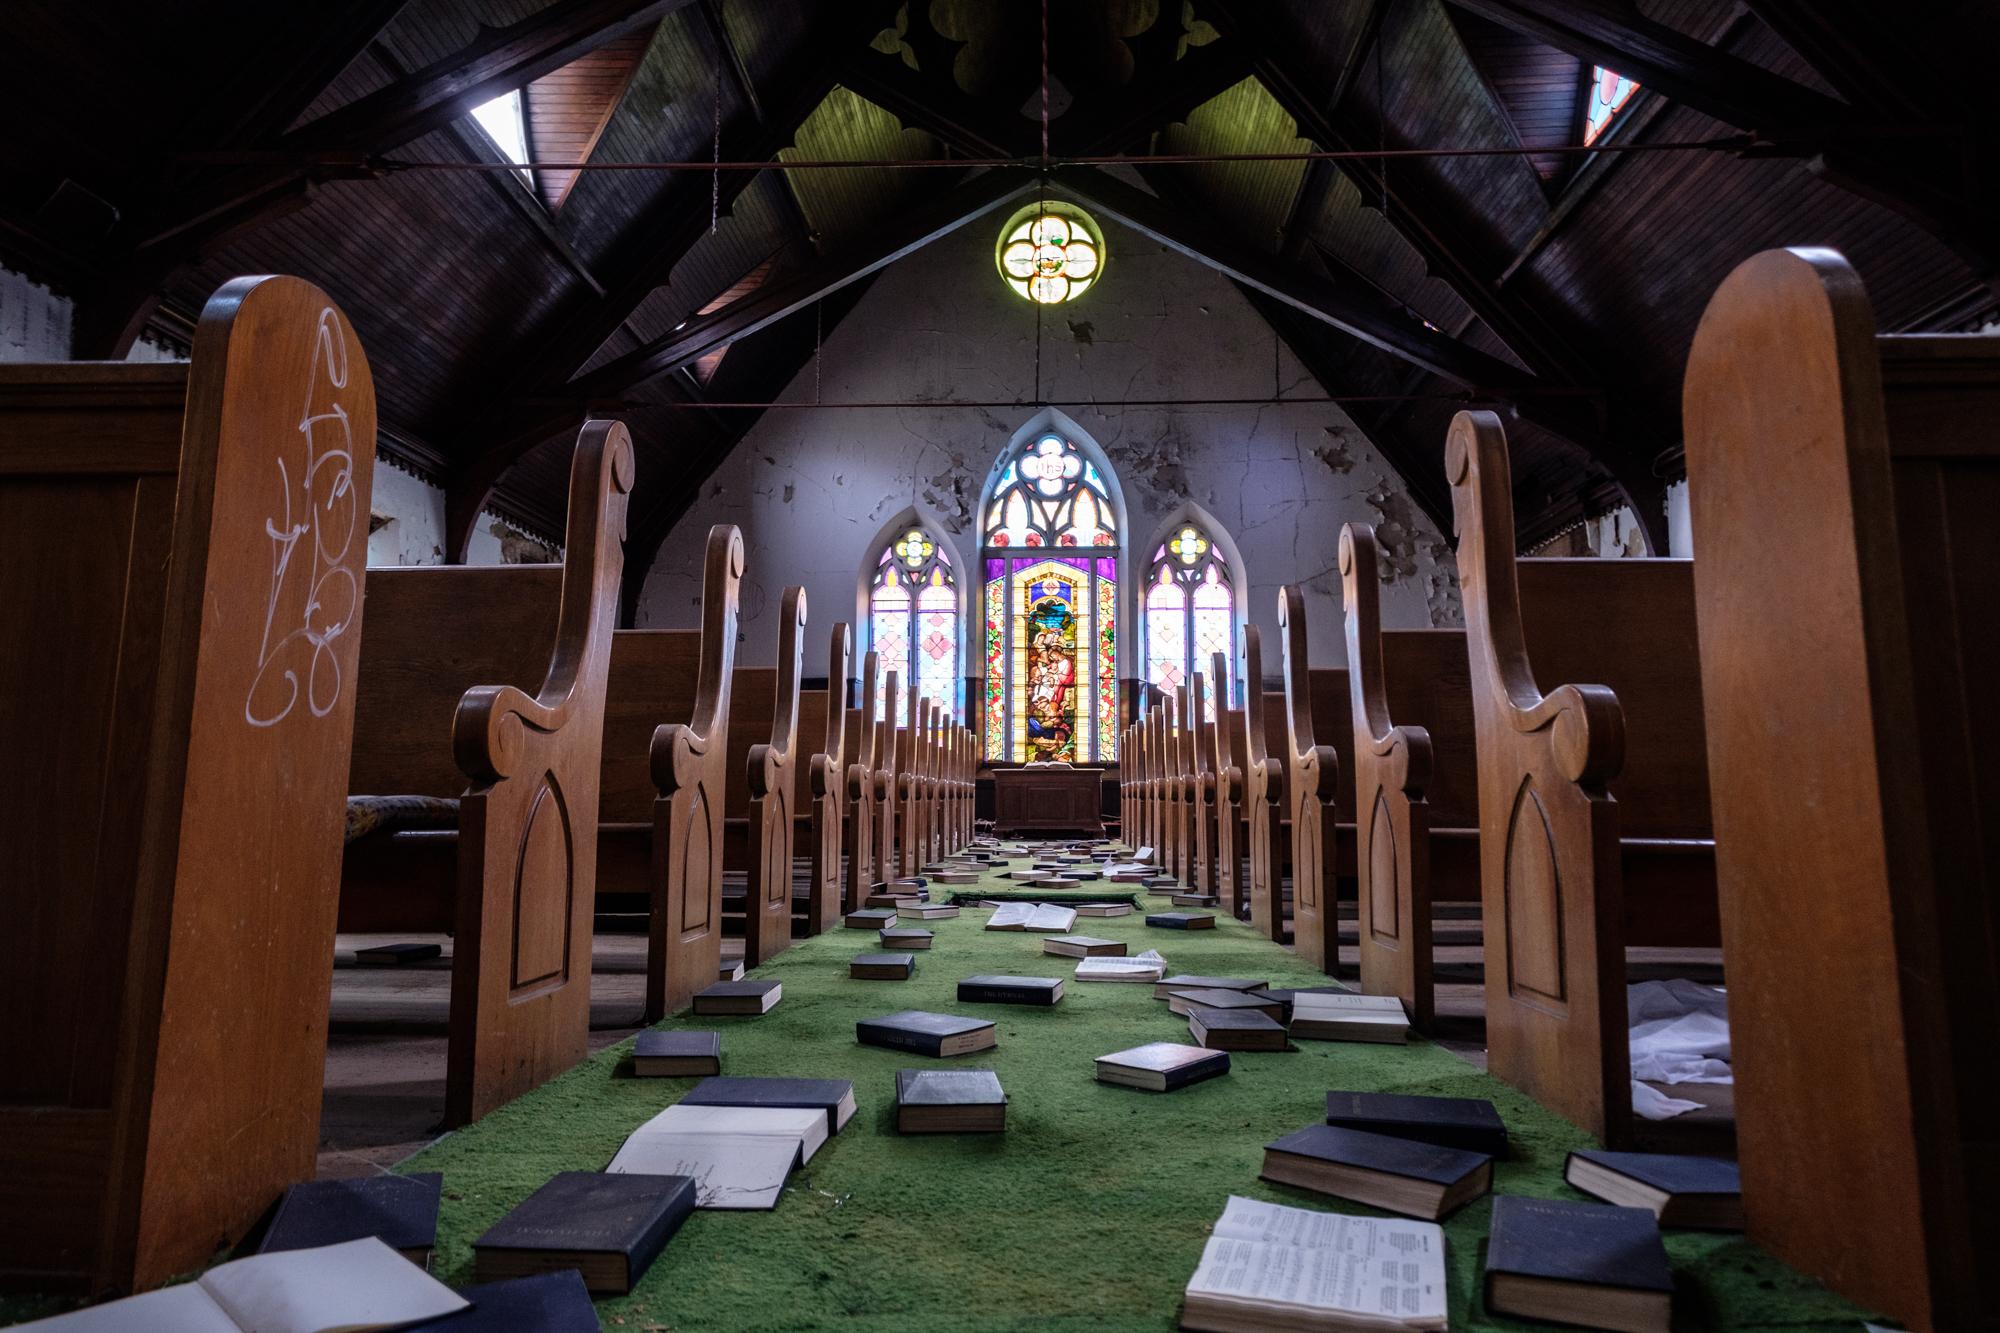 Aisle of Hymns